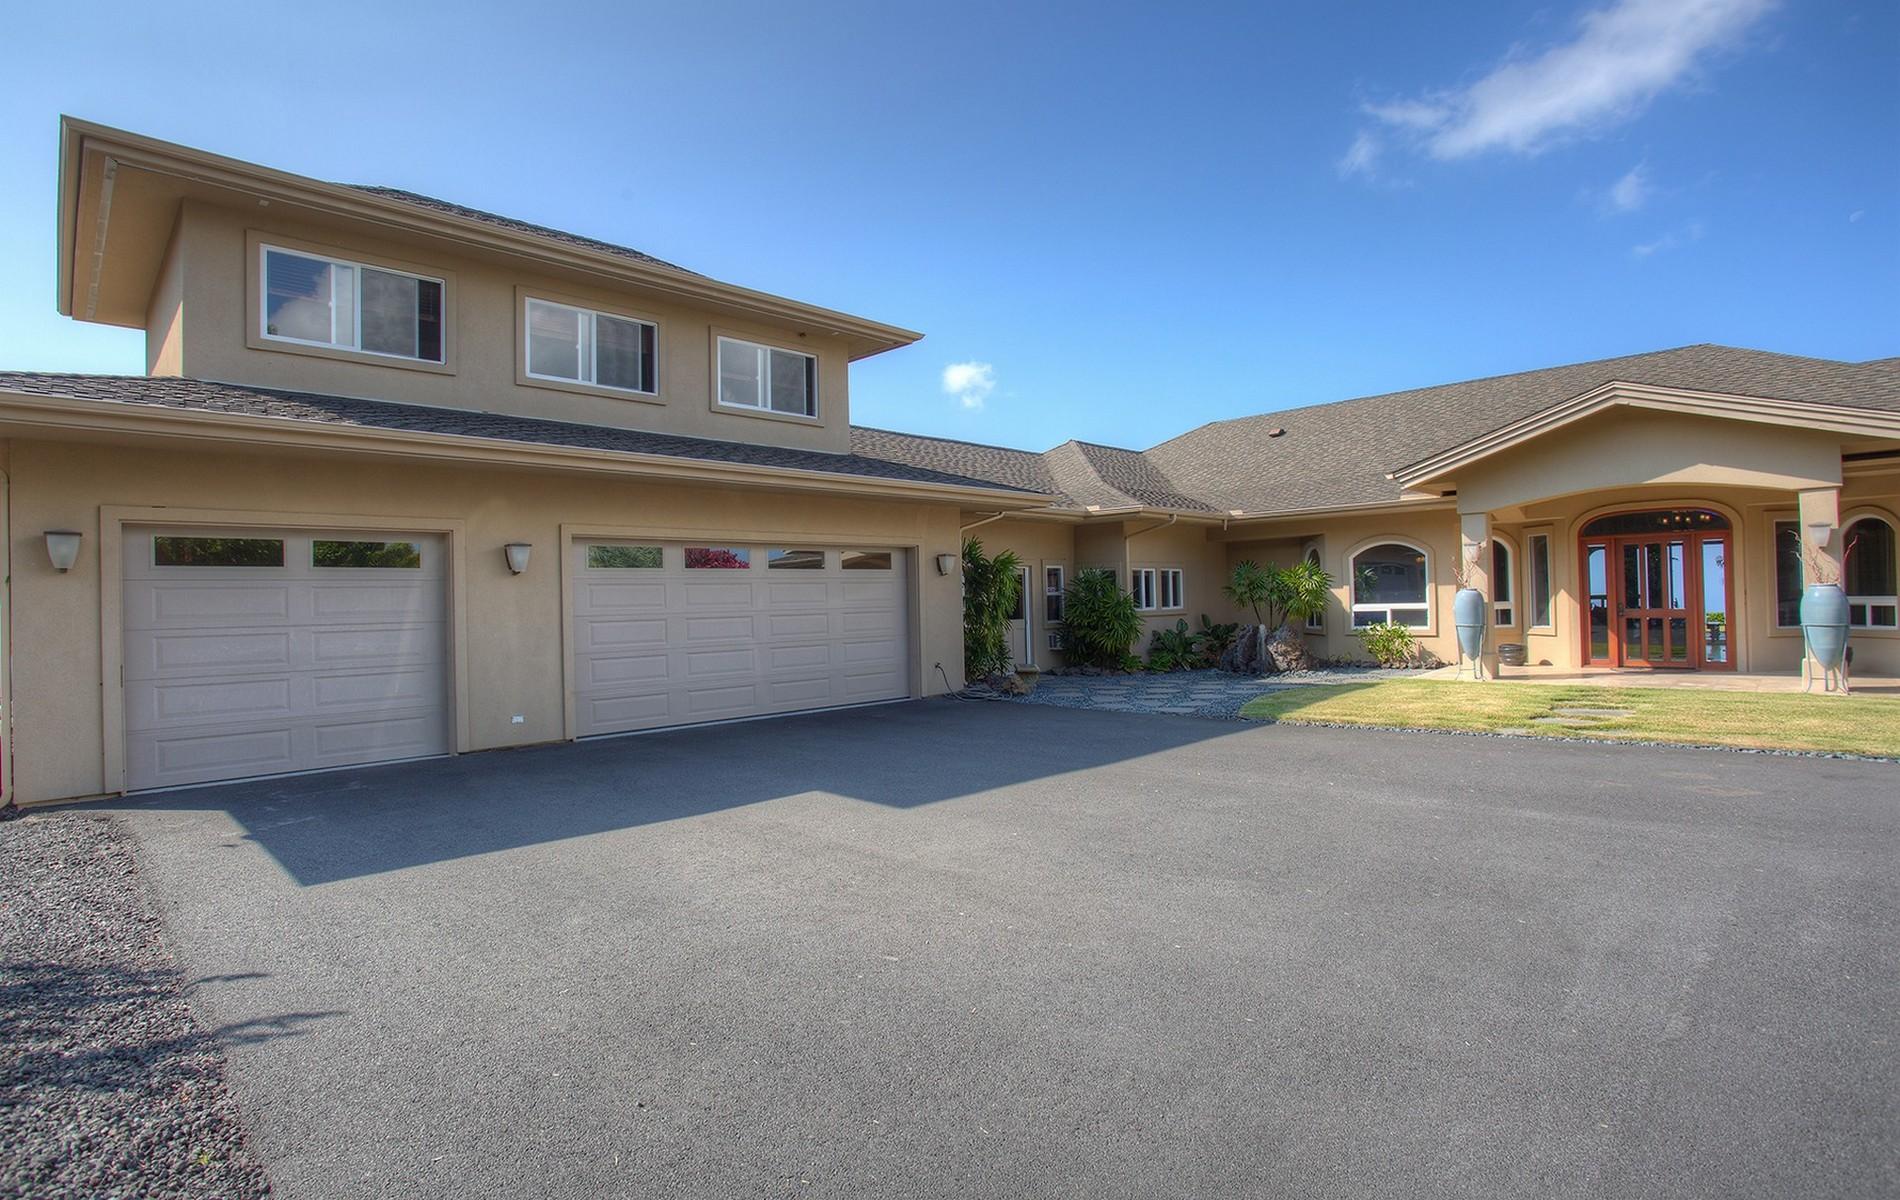 Single Family Home for Sale at Makalei Estates 72-4085 Alahee Pl Kailua-Kona, Hawaii 96740 United States